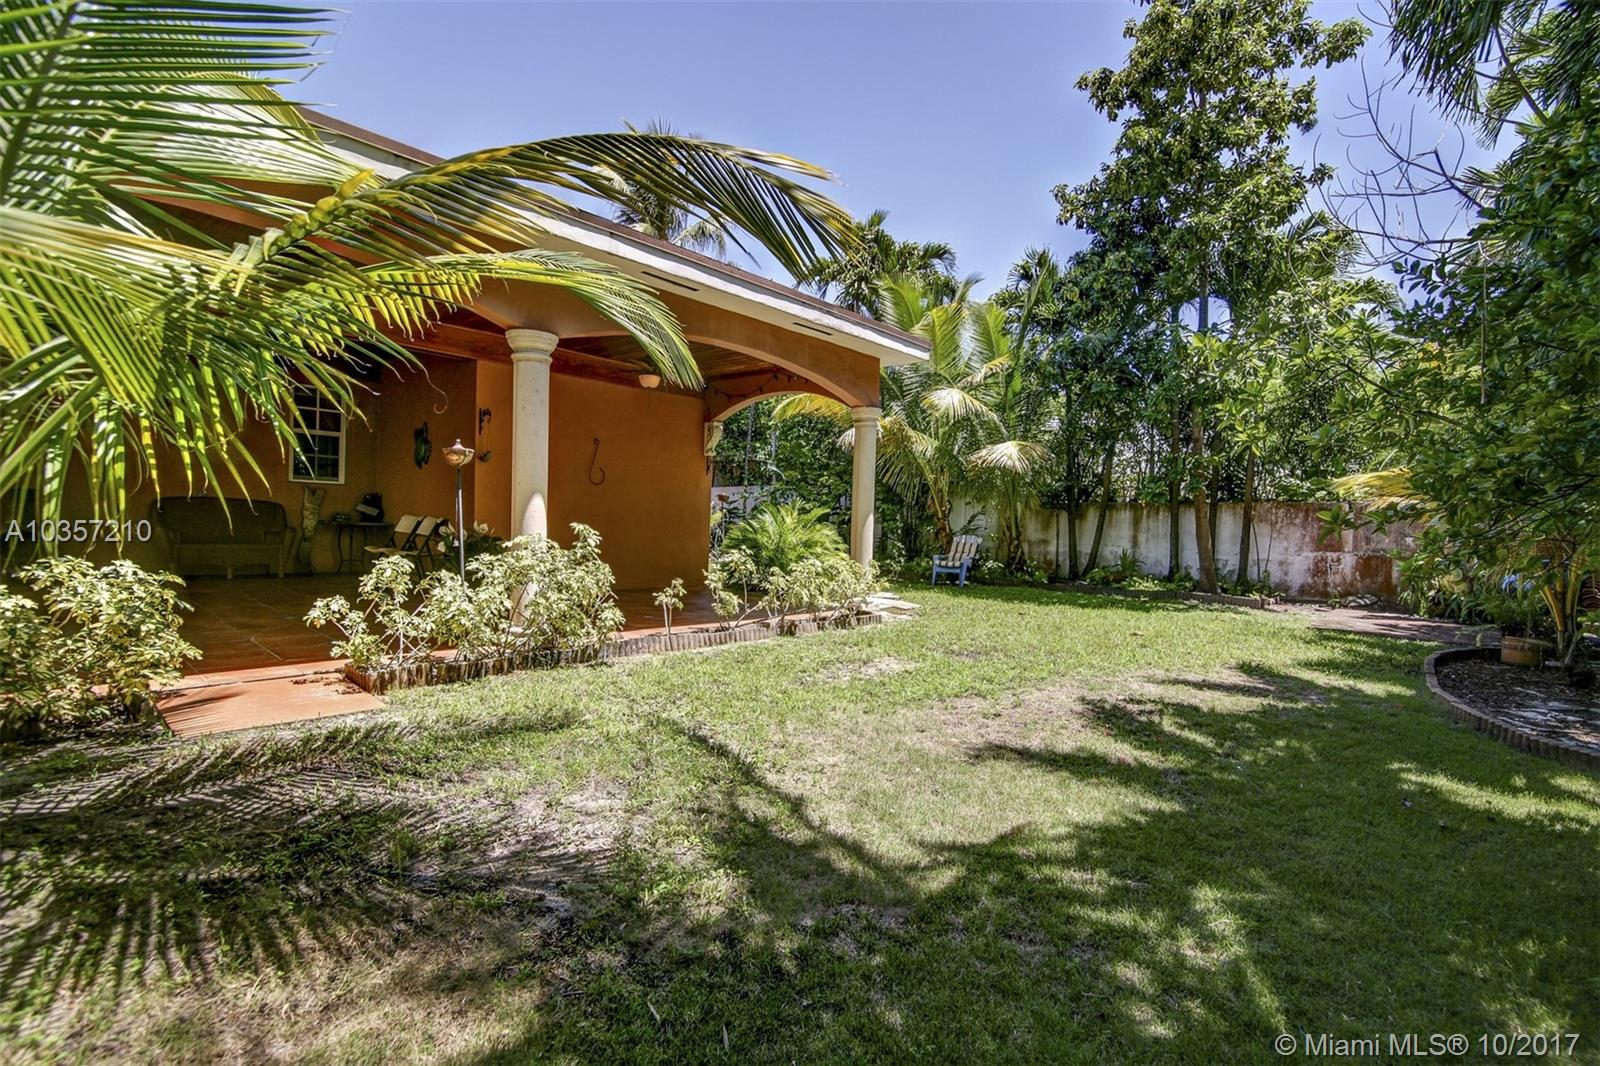 6020 Pine Tree Dr, Miami Beach FL, 33140